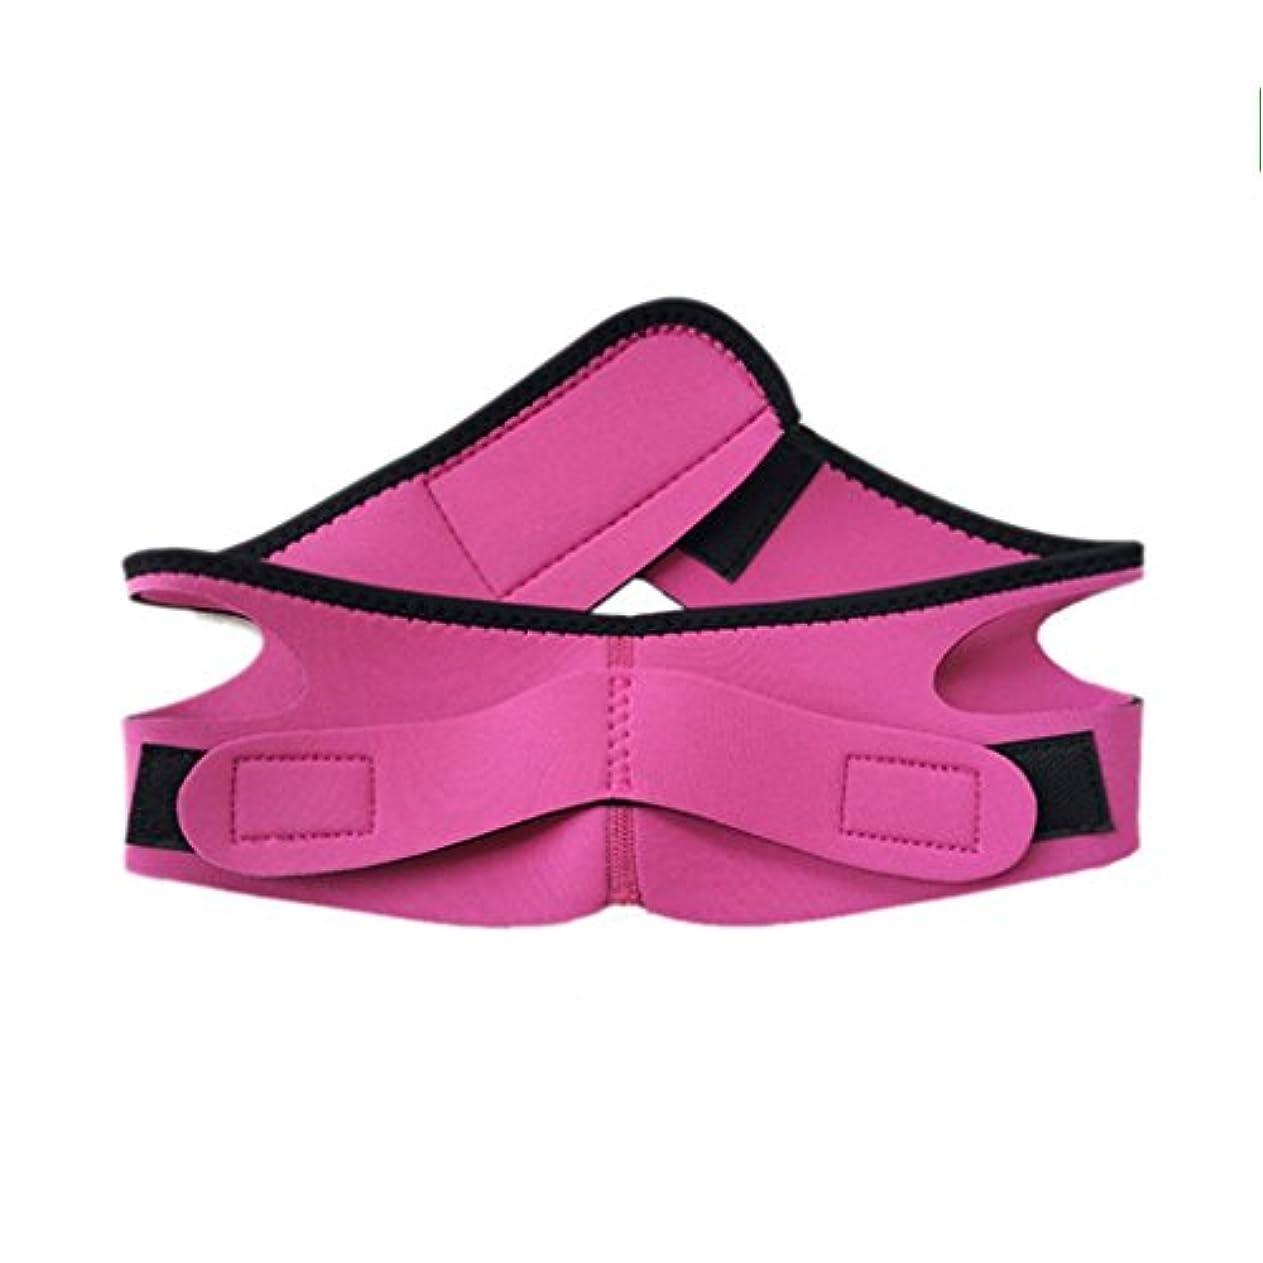 Qi いびき予防、あごの下の顎の転倒 - ベルトを止める - 口呼吸を防ぐ私はいびきを起こす - 眠りと睡眠の矯正アーティファクト(68cm * 8.5cm) Xia (色 : Pink)